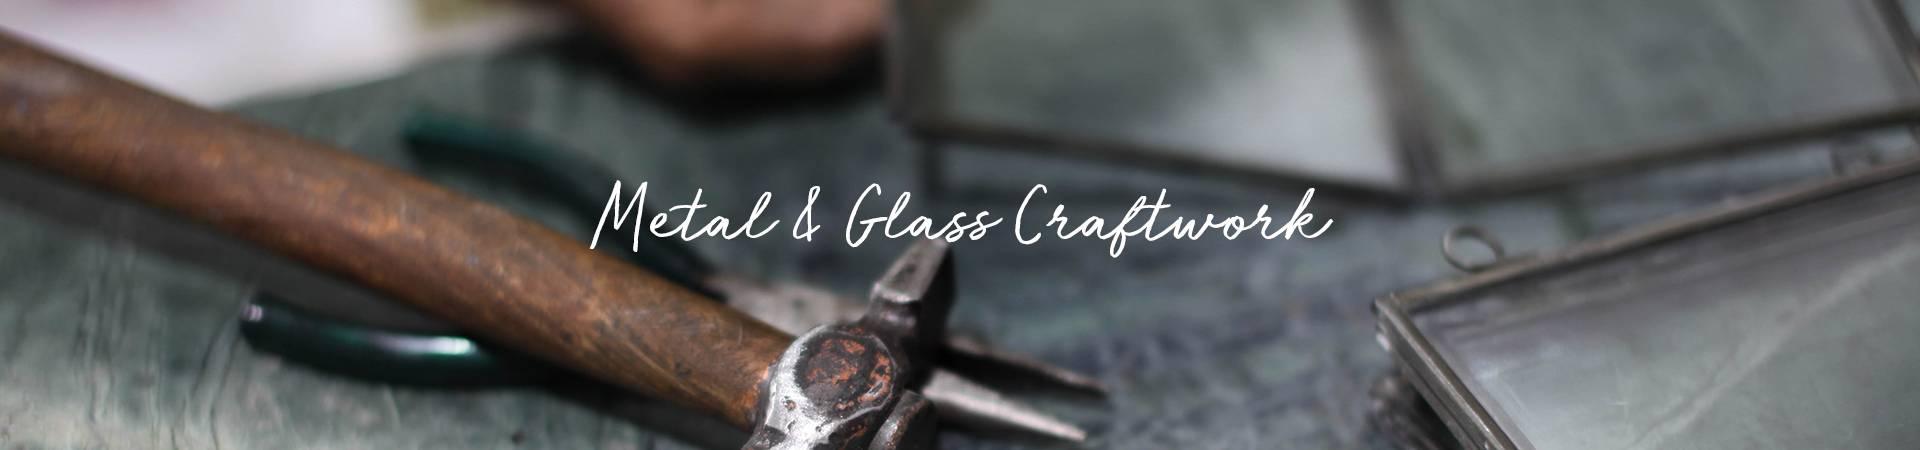 Nkuku_Metal-&-Glass-Craftwork_Header_Desktop.jpg